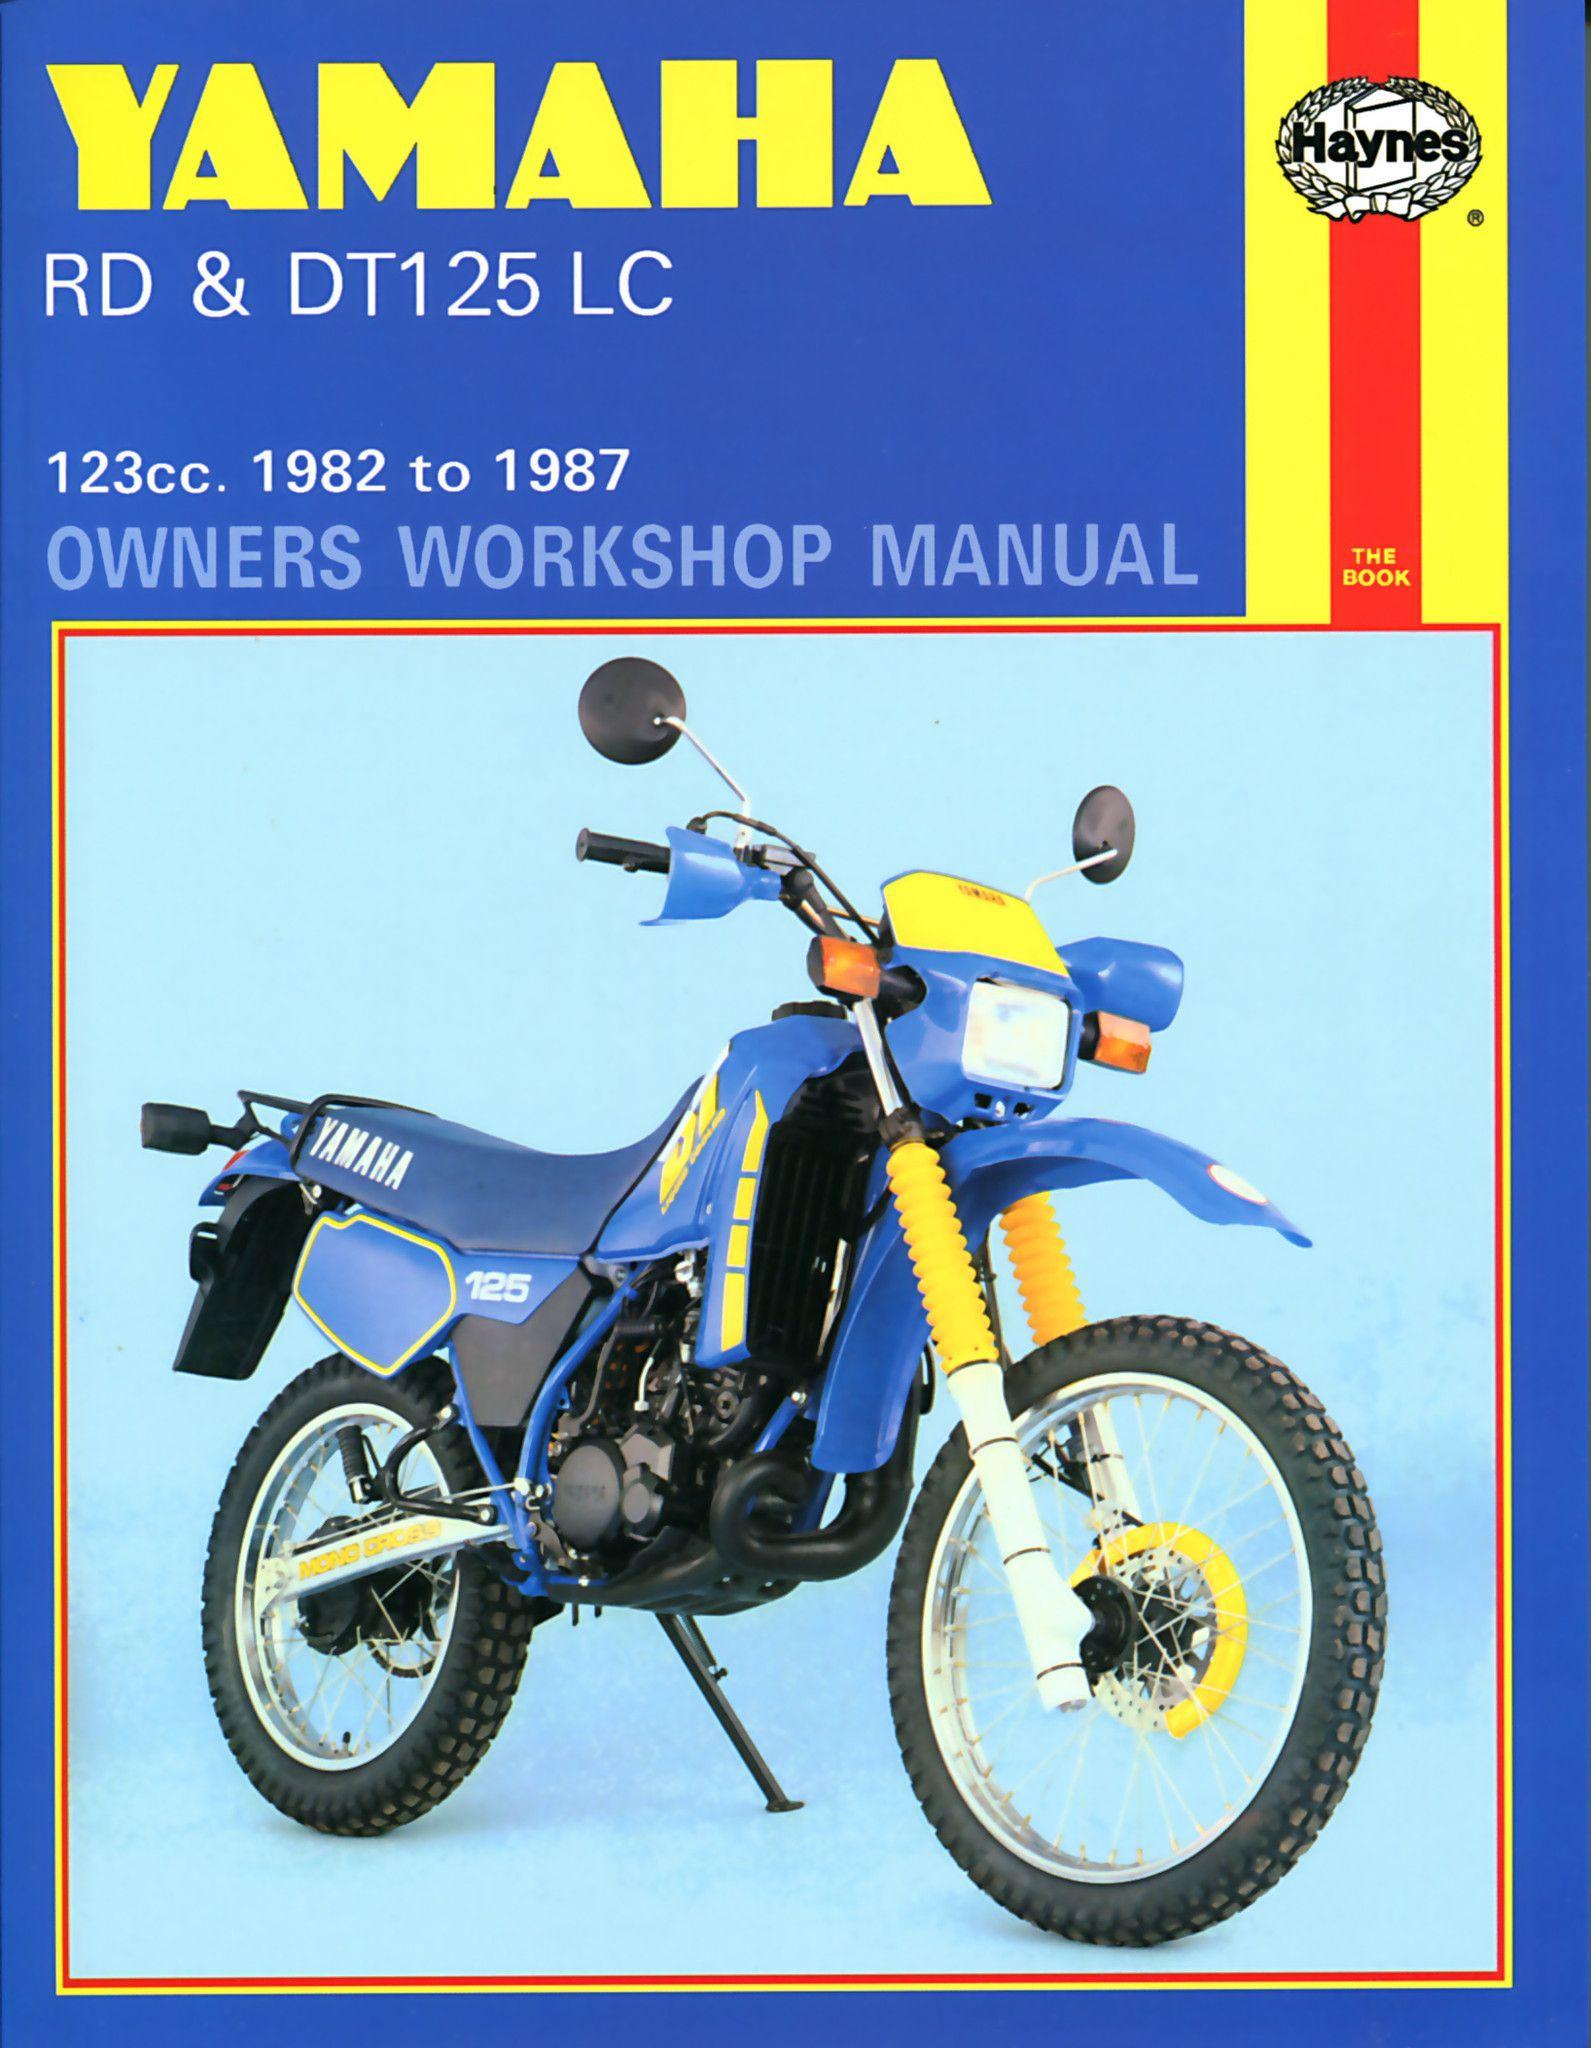 haynes m887 repair manual for 1982 87 yamaha rd and dt 125 lc rh pinterest com CDI for Yamaha WR 200 Yamaha 200 Dual Sport Motorcycle